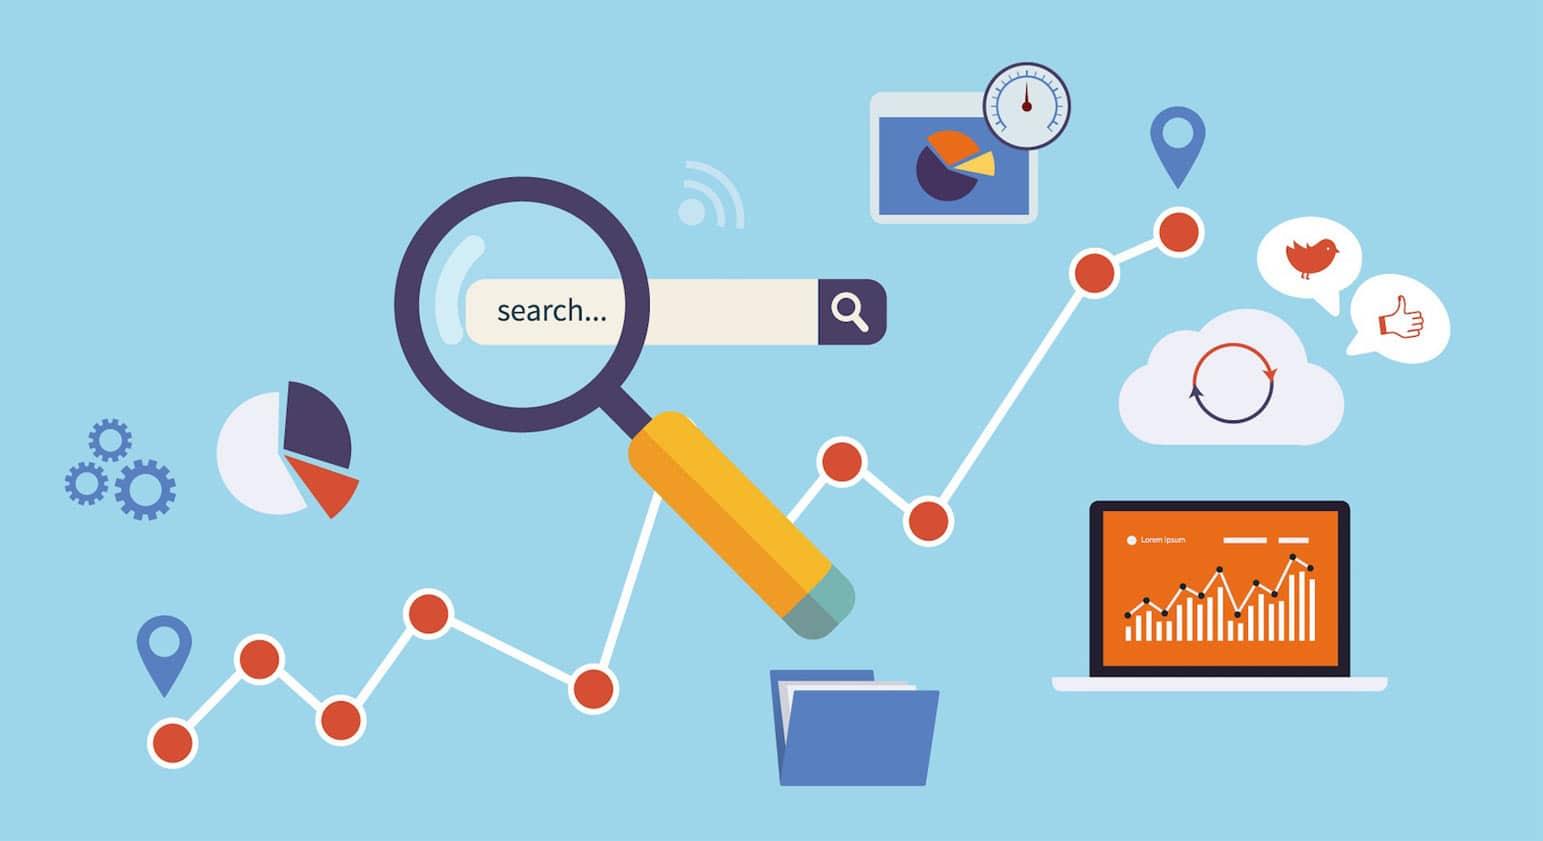 Estrategias de marketing digital ¡Ideas para que te inspires!